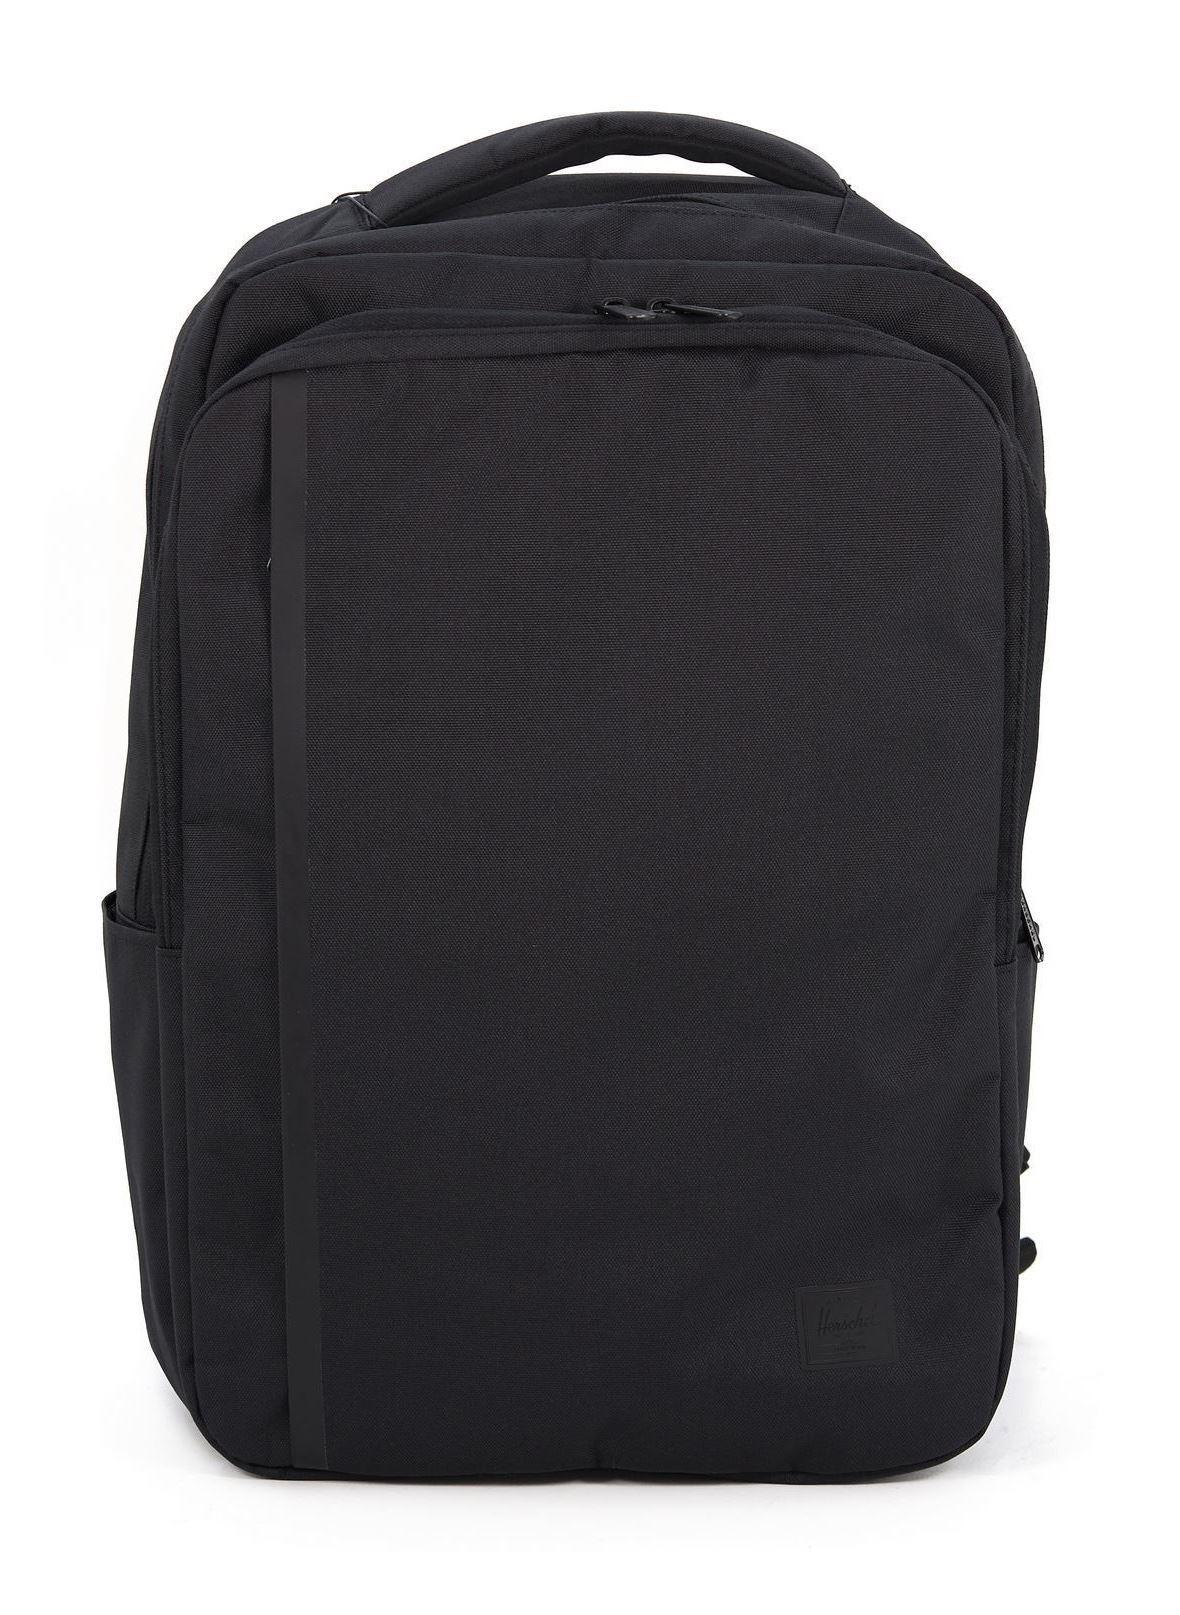 Immagine di Travel Backpack nero